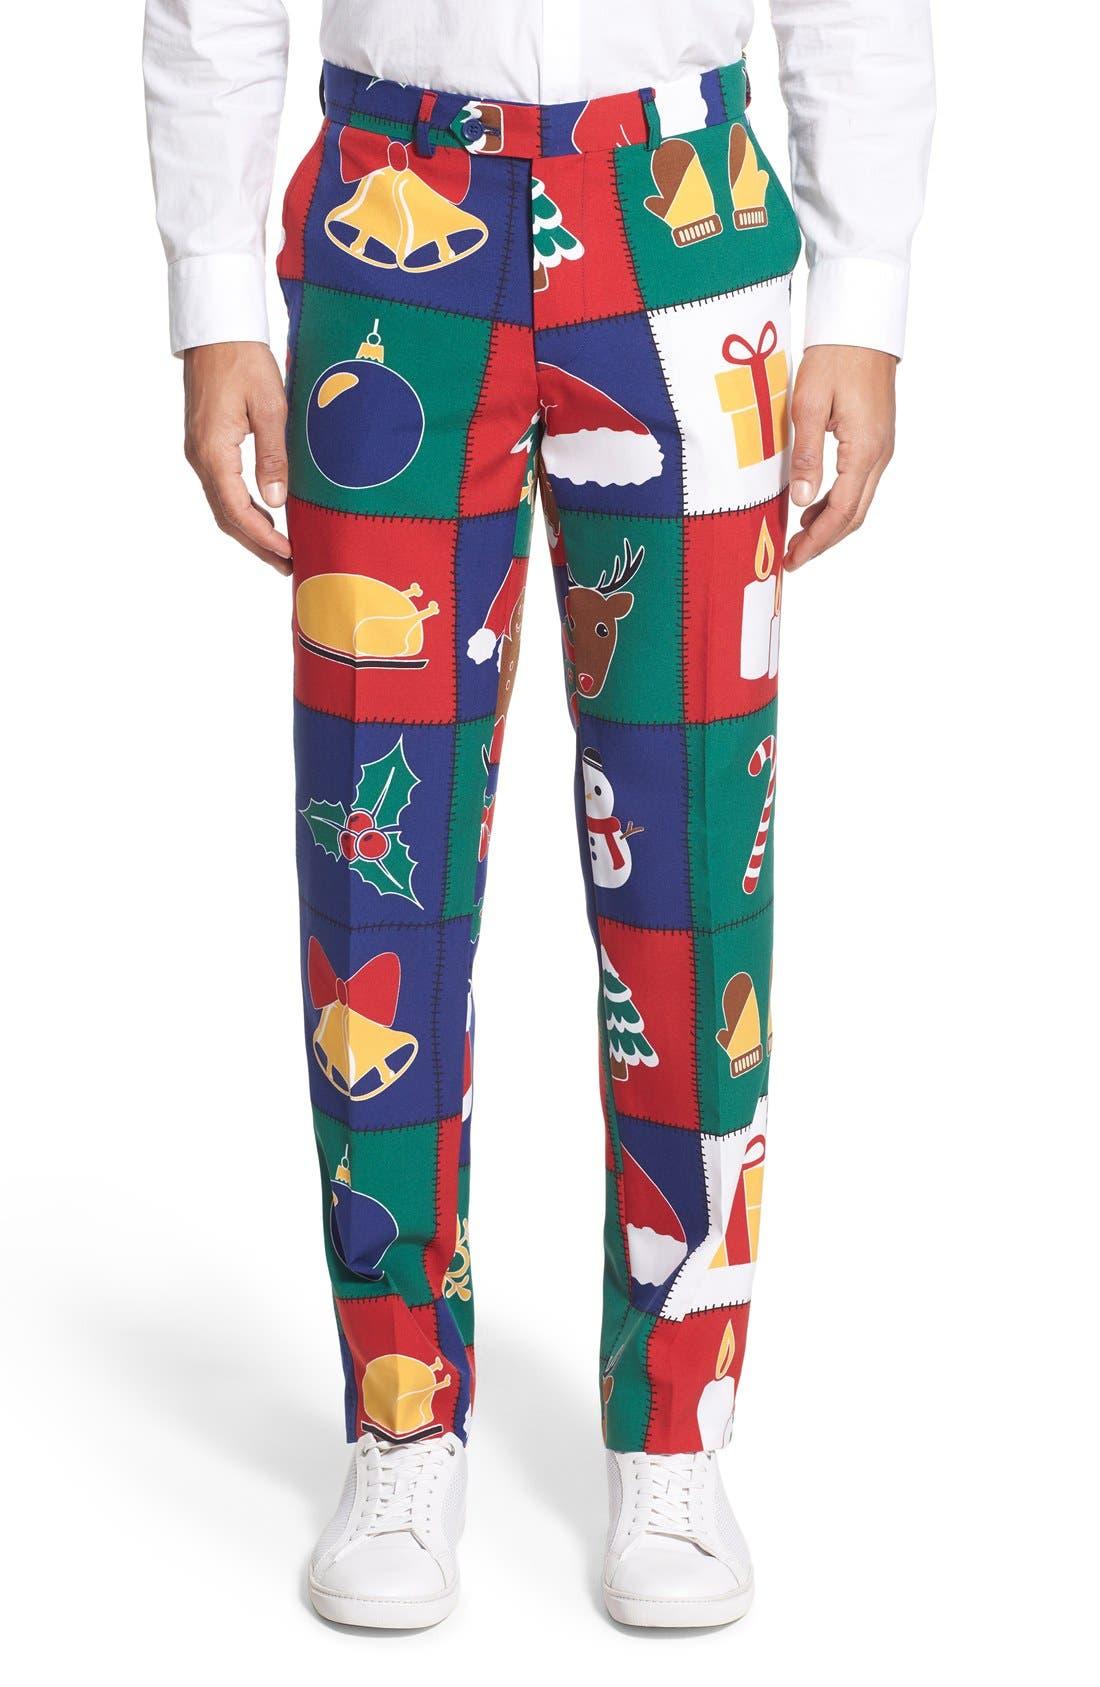 'Quilty Pleasure' Holiday Suit & Tie,                             Alternate thumbnail 6, color,                             300